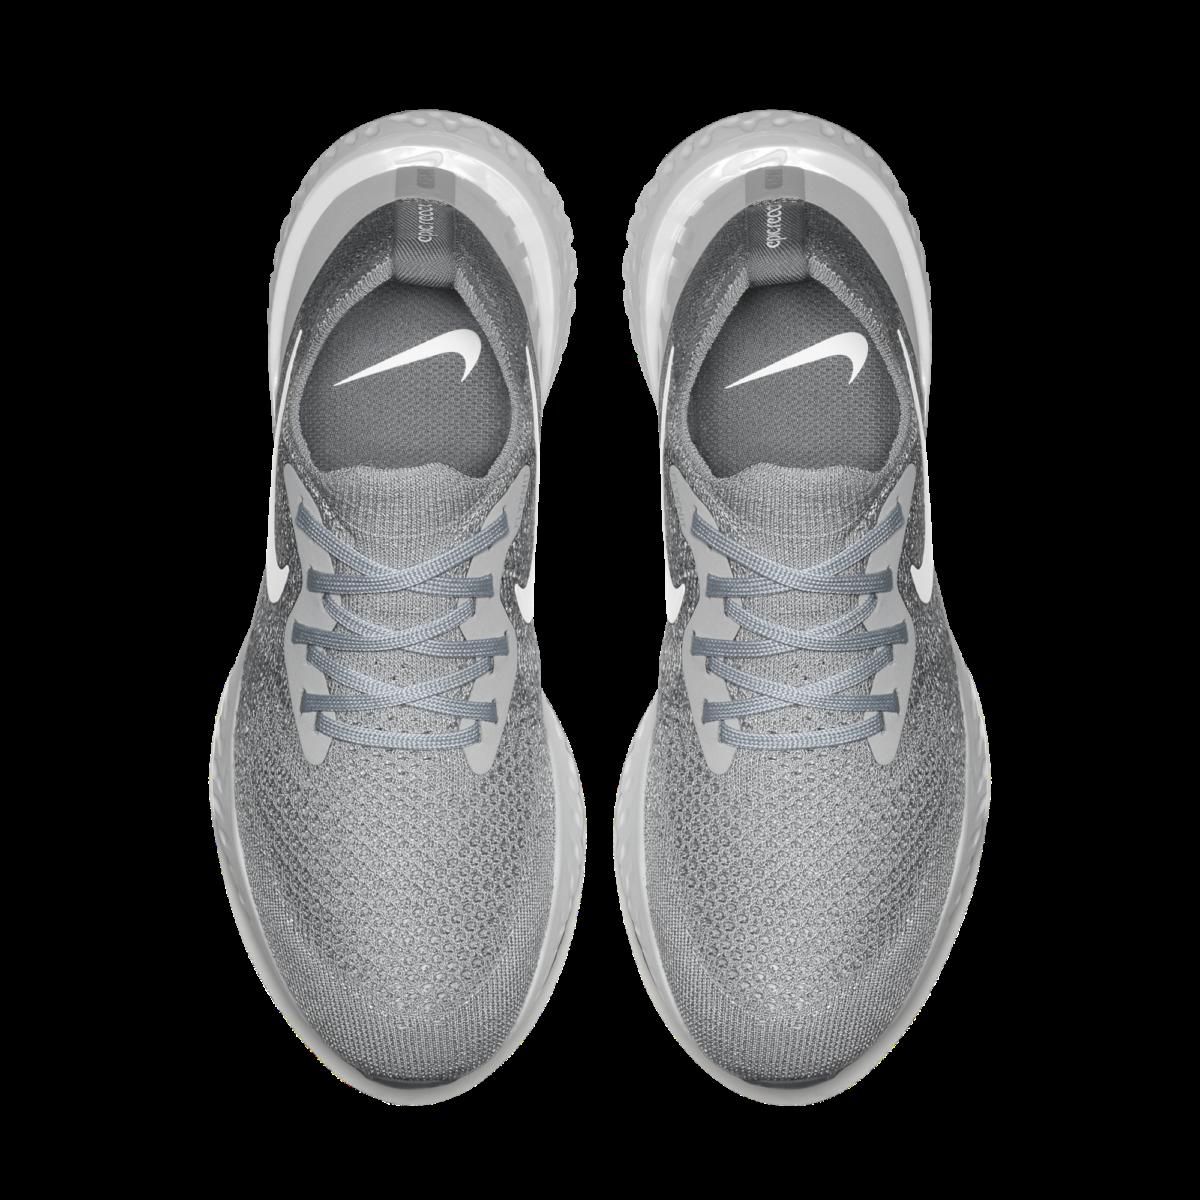 99e73f7a16075 Nike Epic React Flyknit Wolf Grey (W) - 3